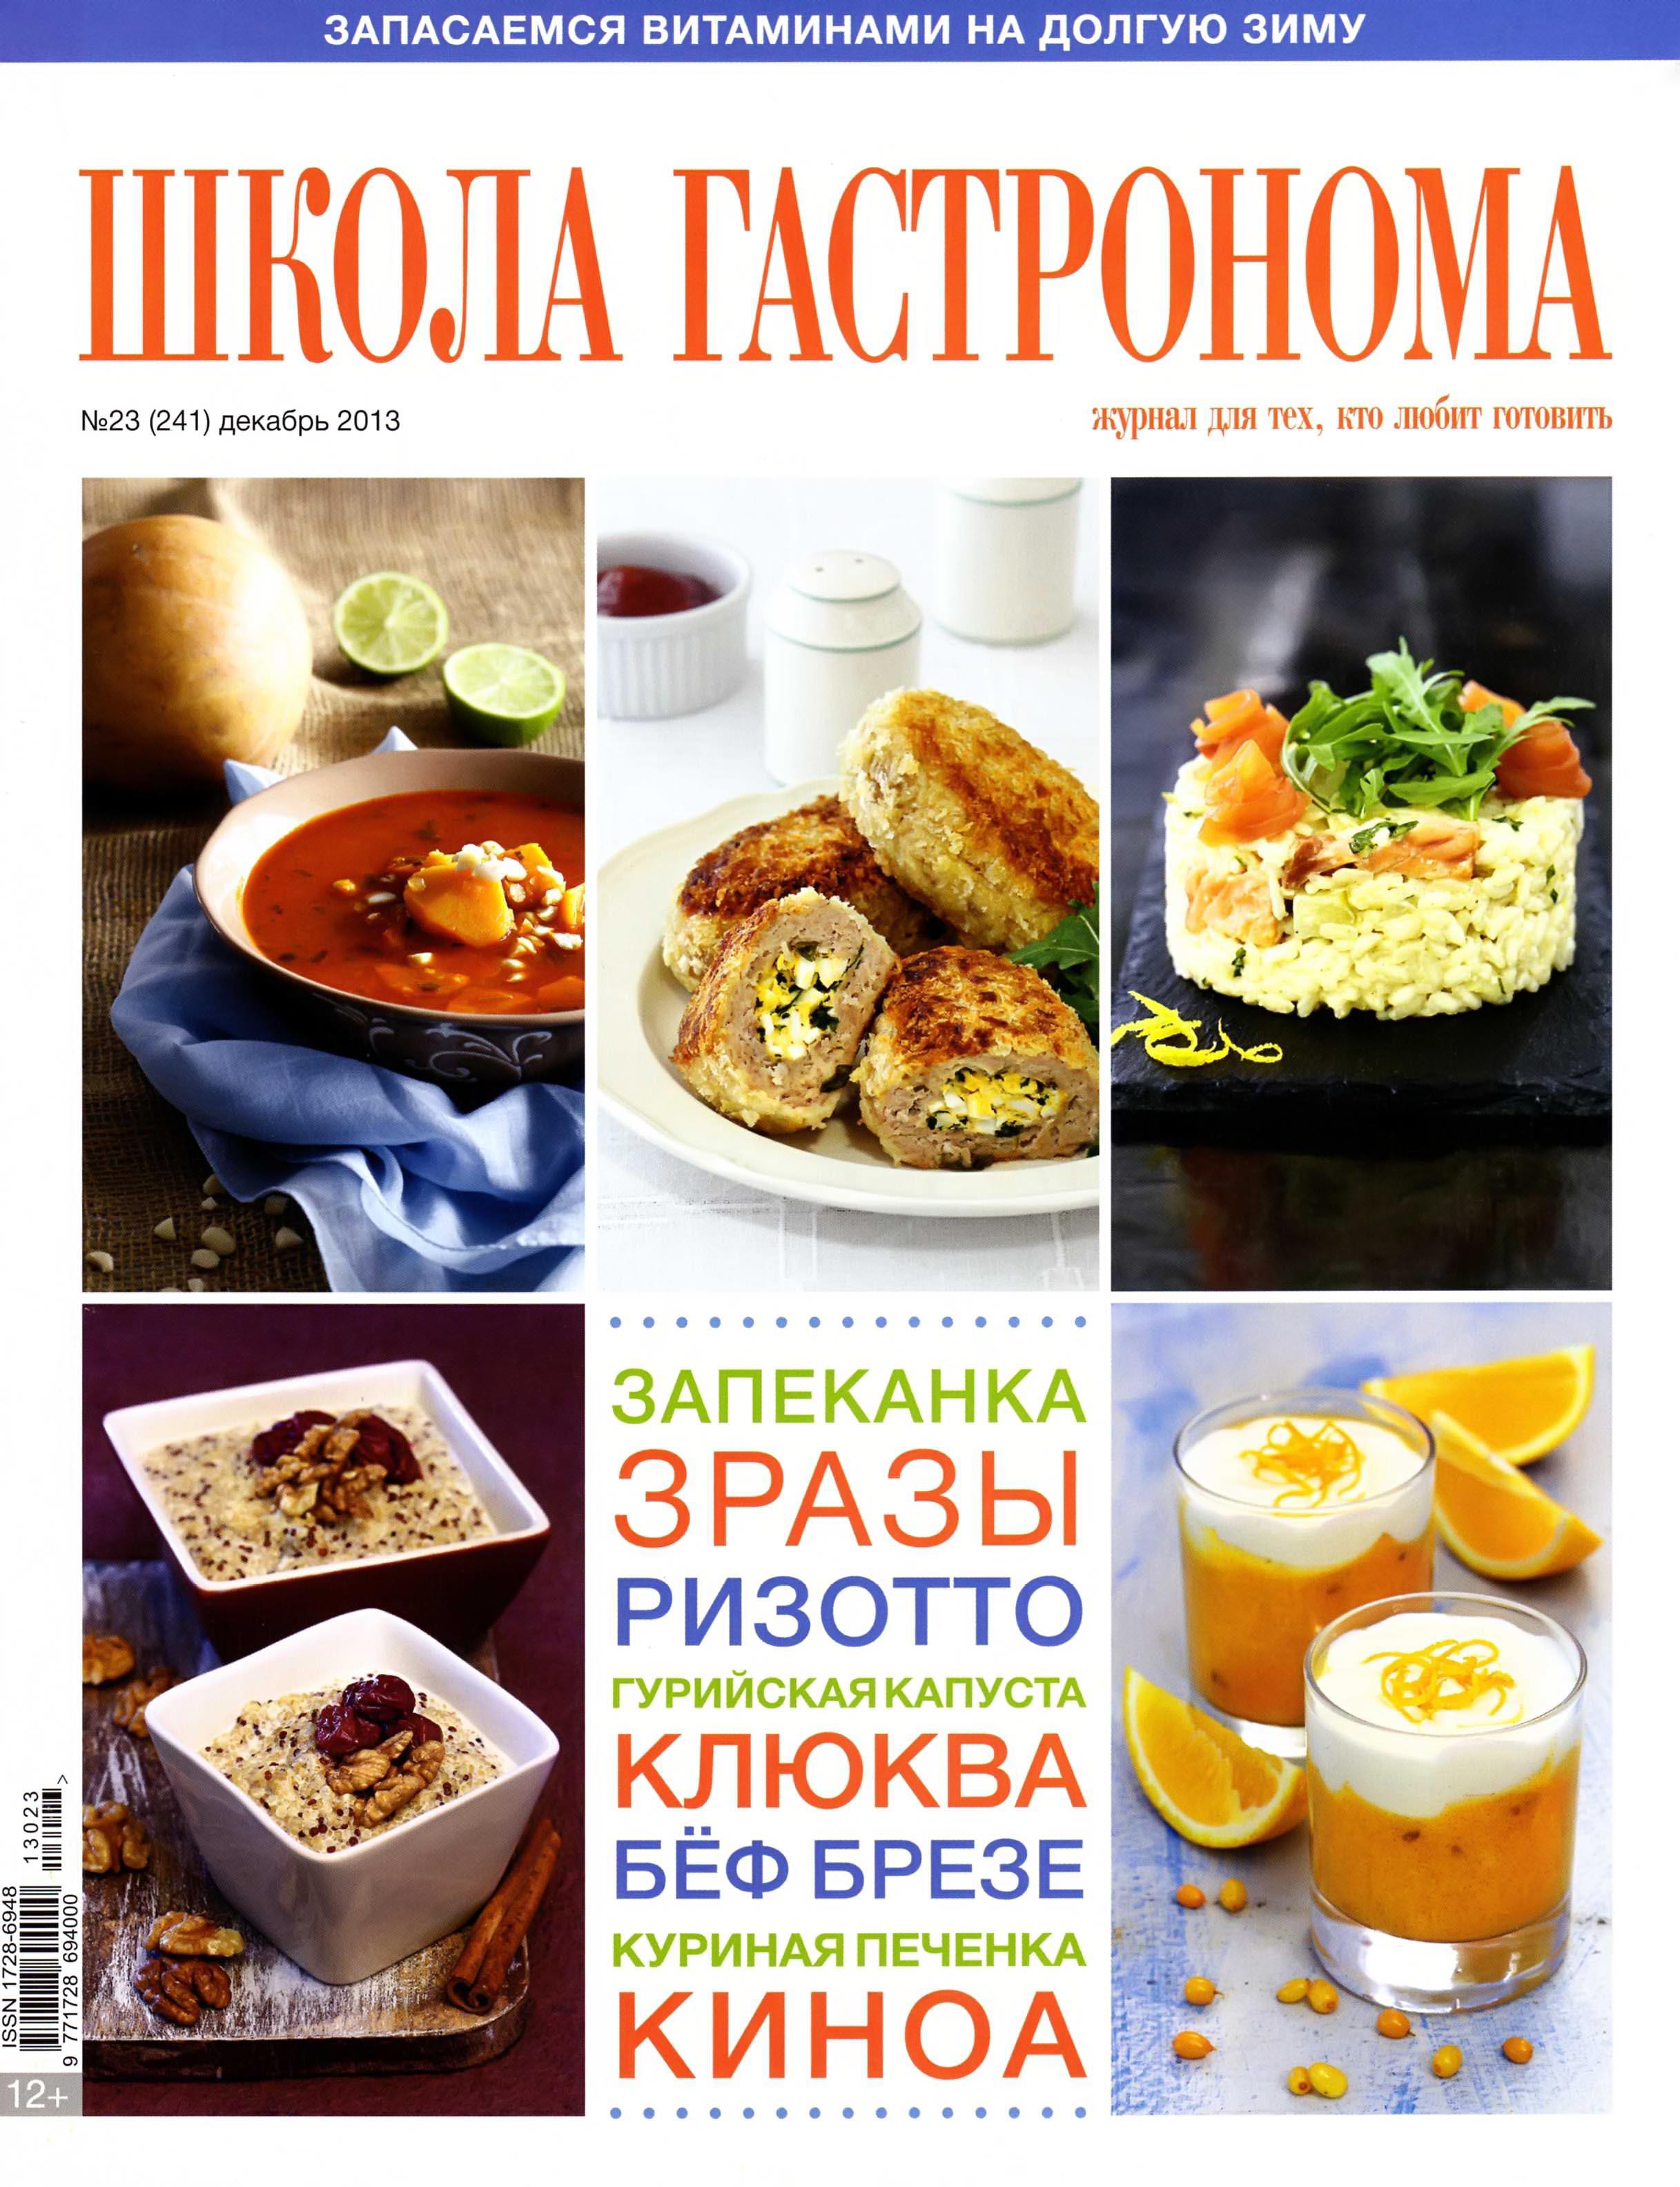 SHkola gastronoma    23 2013 goda Школа гастронома